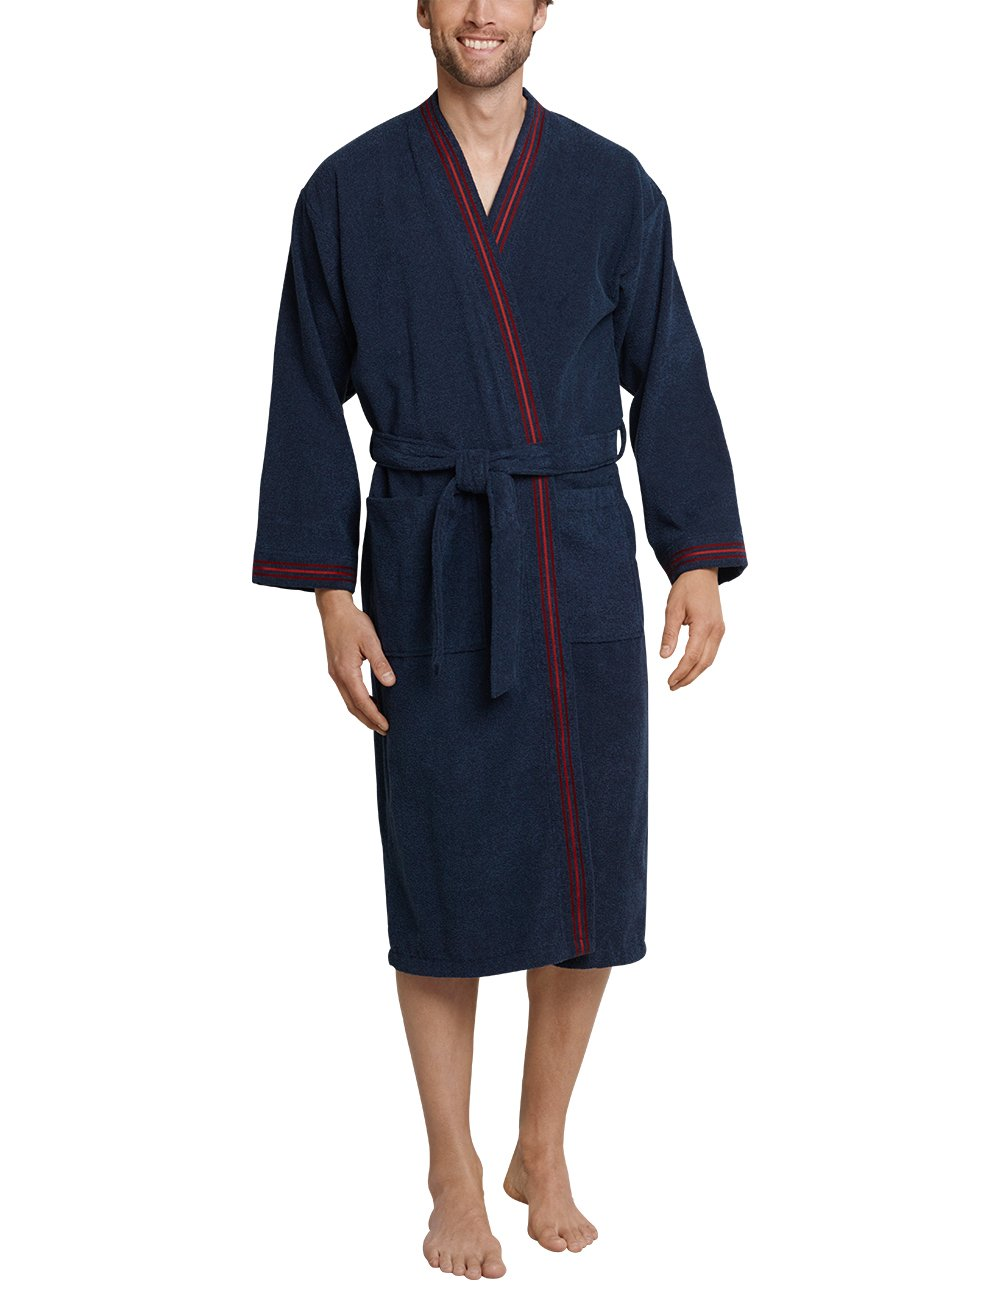 Schiesser Bademantel ChambreBleudunkelblau Du mel818Xx Fabricant056Homme Robe De largetaille cK1JlF